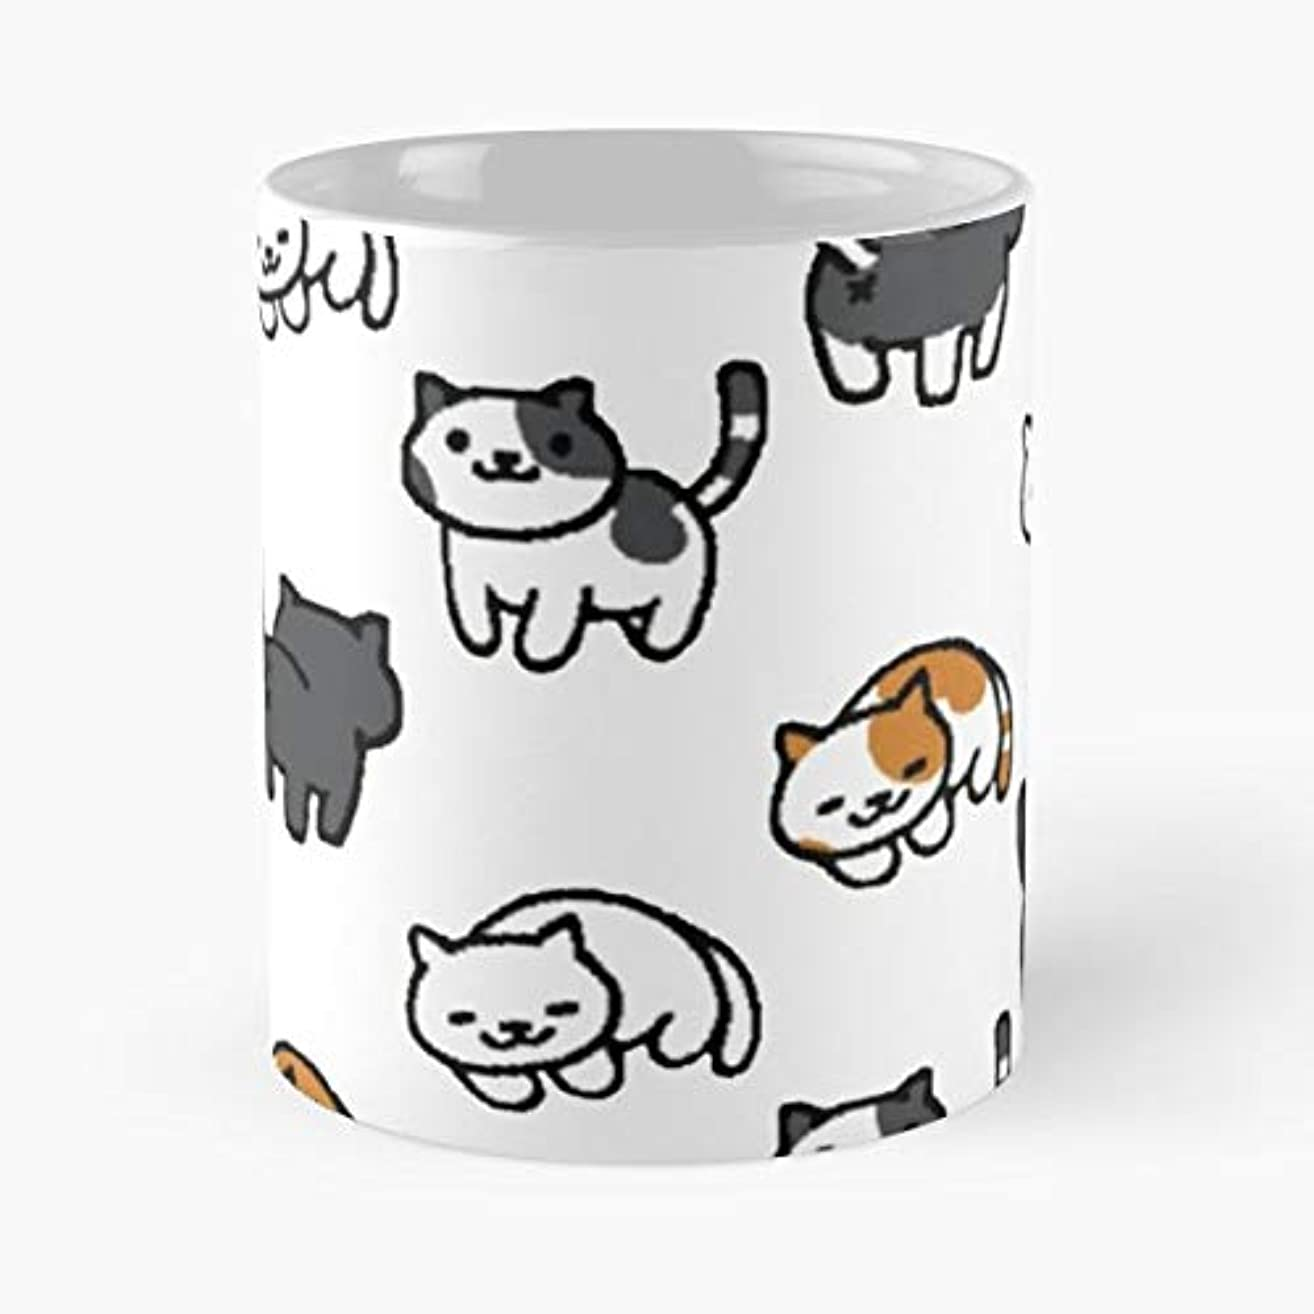 Neko Atsume Cats Kittens -funny Gifts For Men And Women Gift Coffee Mug Tea Cup White-11 Oz.